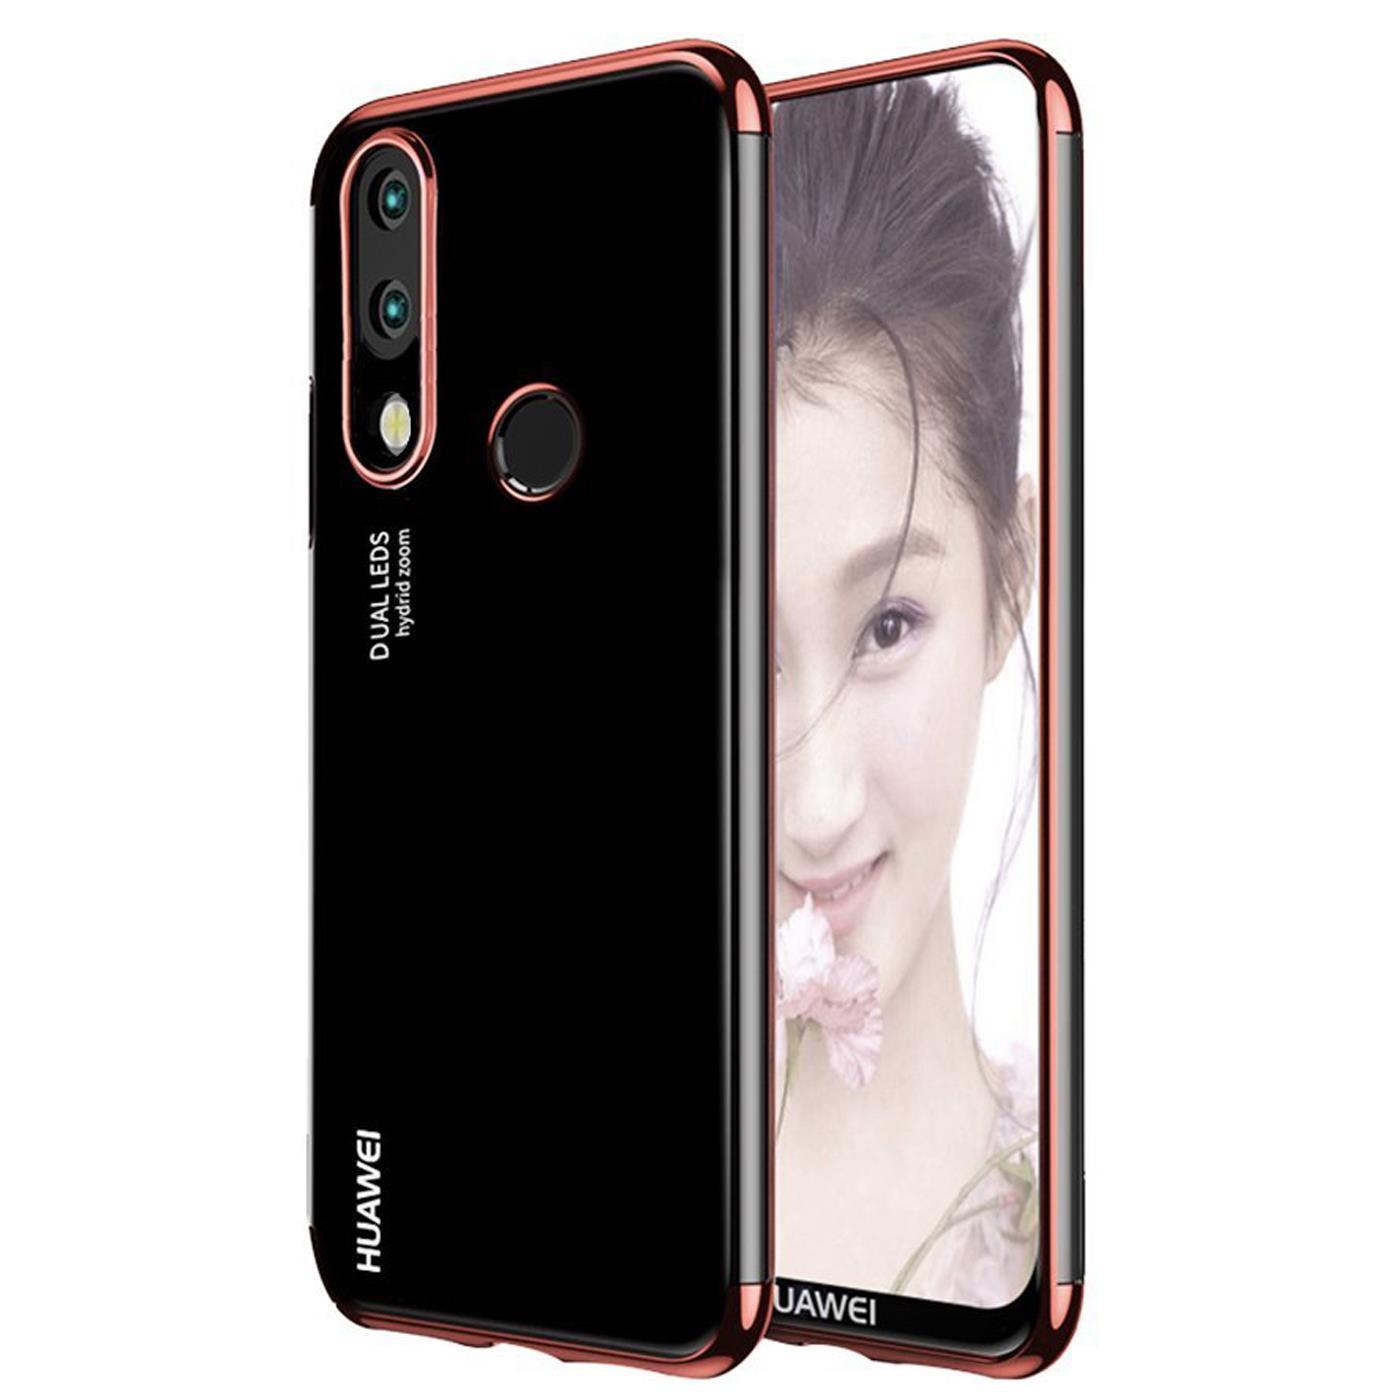 Silikon-Klar-Case-fuer-Huawei-p20-Lite-Ultra-Slim-Stossfeste-Gel-Rueckseite Indexbild 20